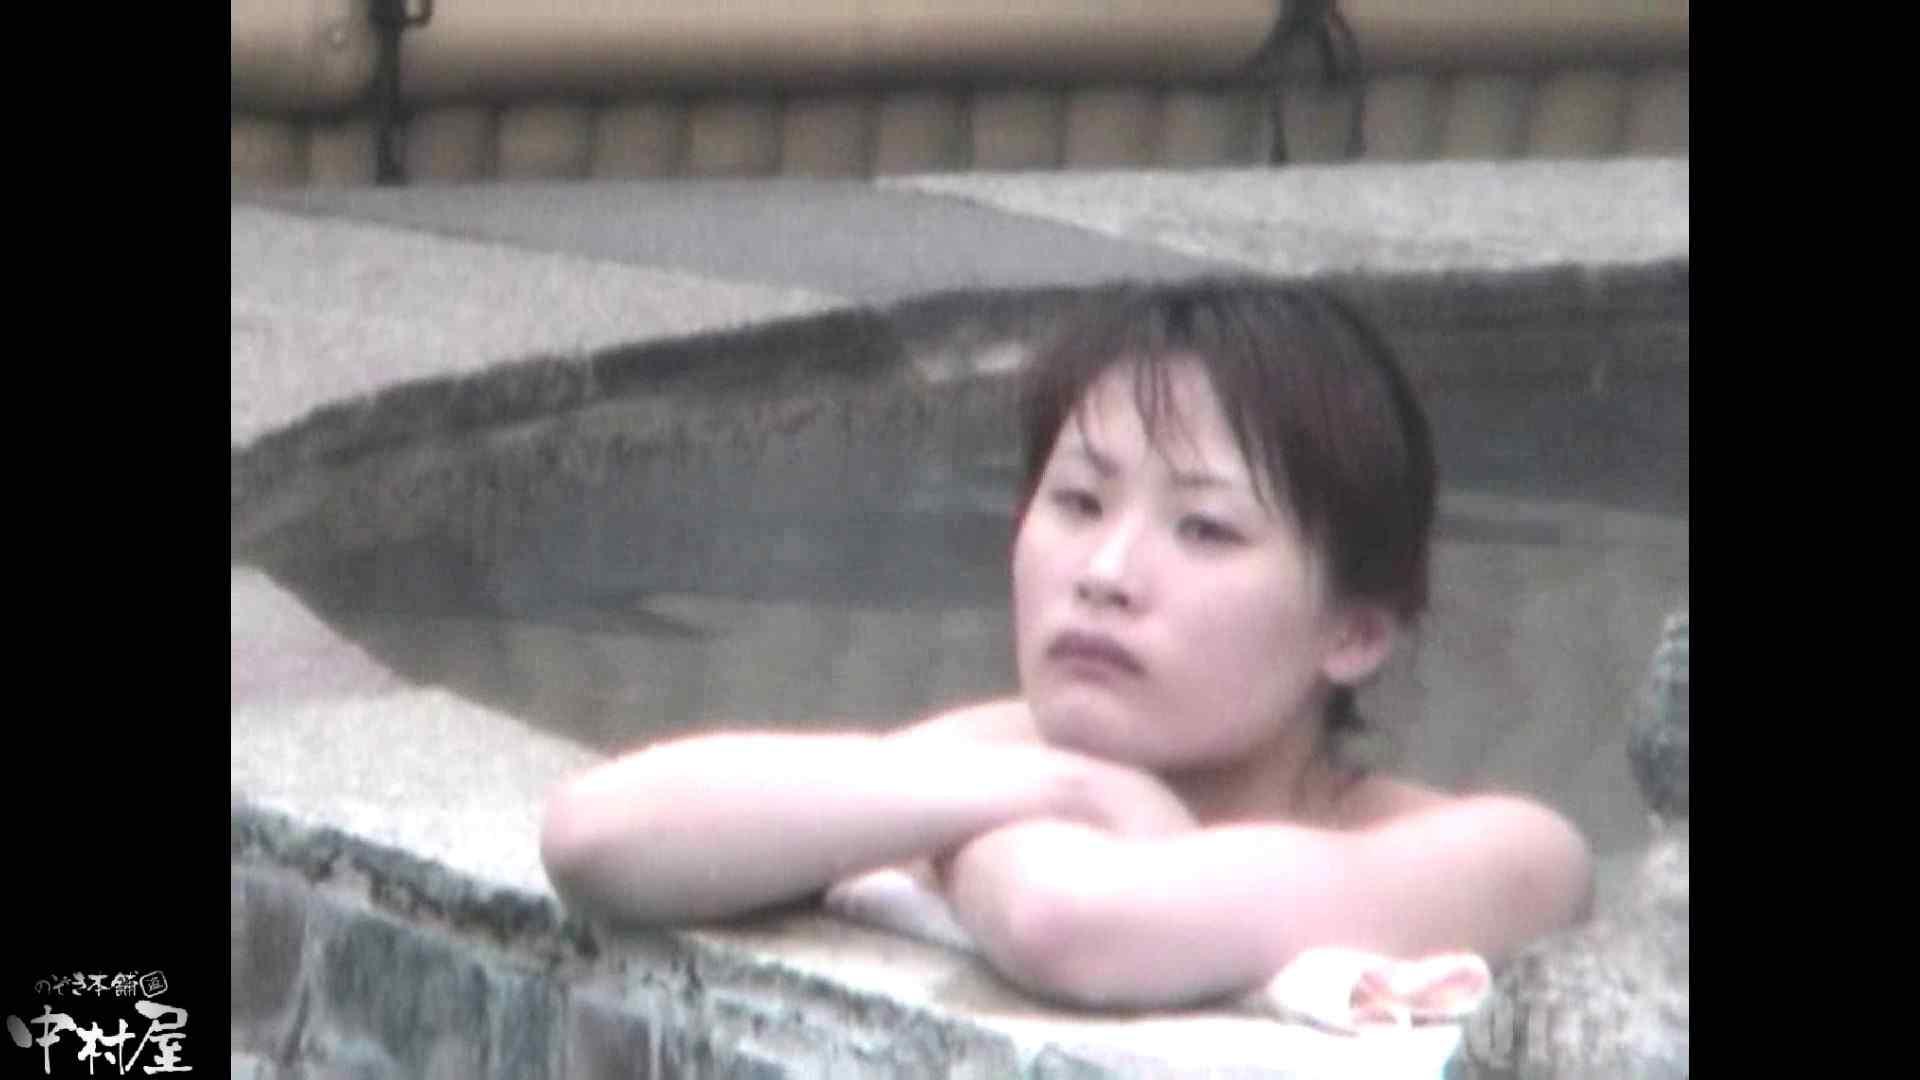 Aquaな露天風呂Vol.878潜入盗撮露天風呂十四判湯 其の三 潜入  48連発 27